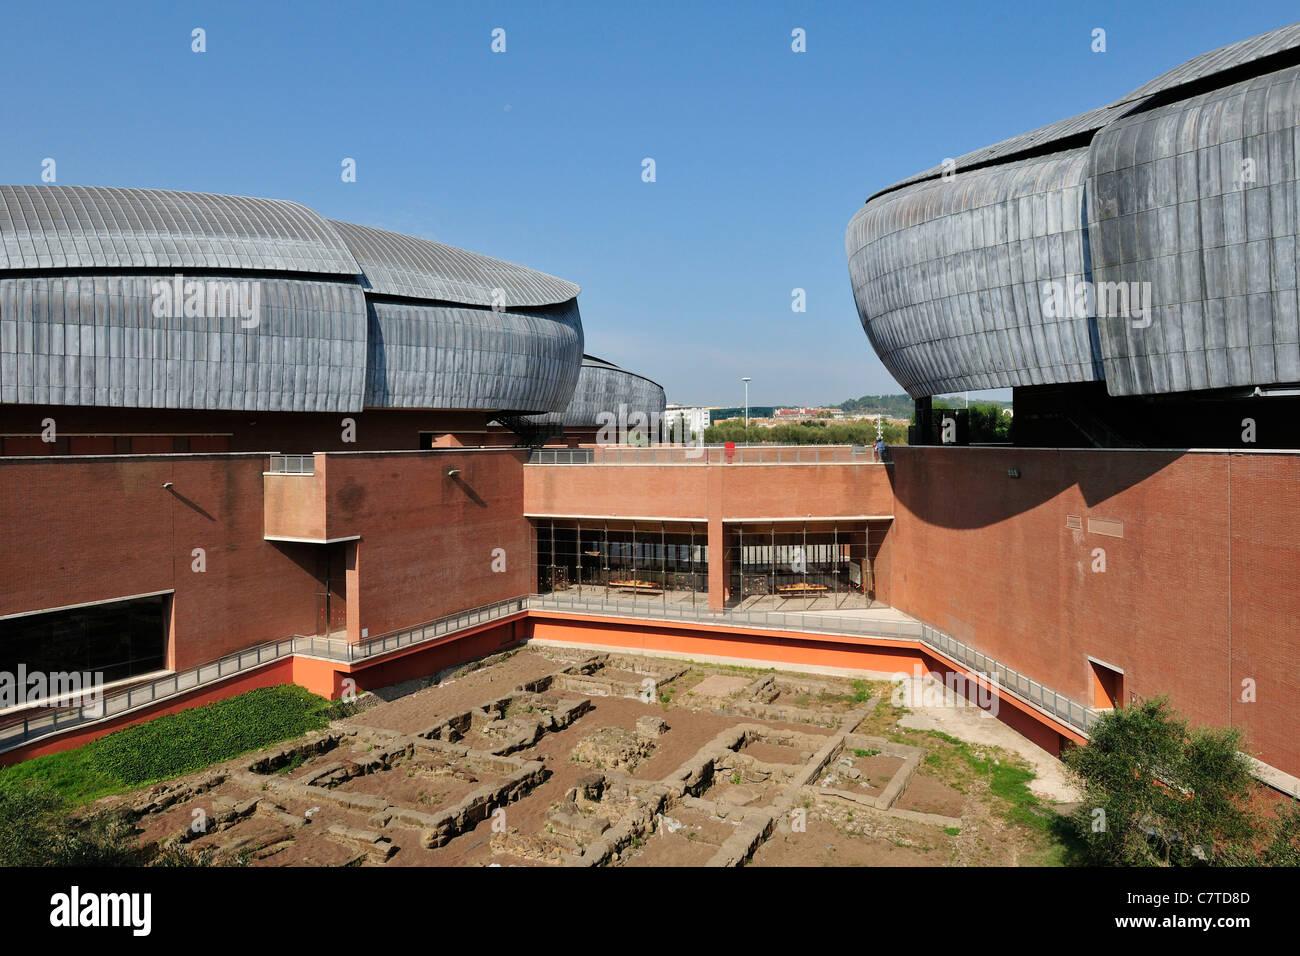 Rome. Italy. Auditorium, Parco della Musica, designed by Renzo Piano & the remains of an ancient roman villa. - Stock Image